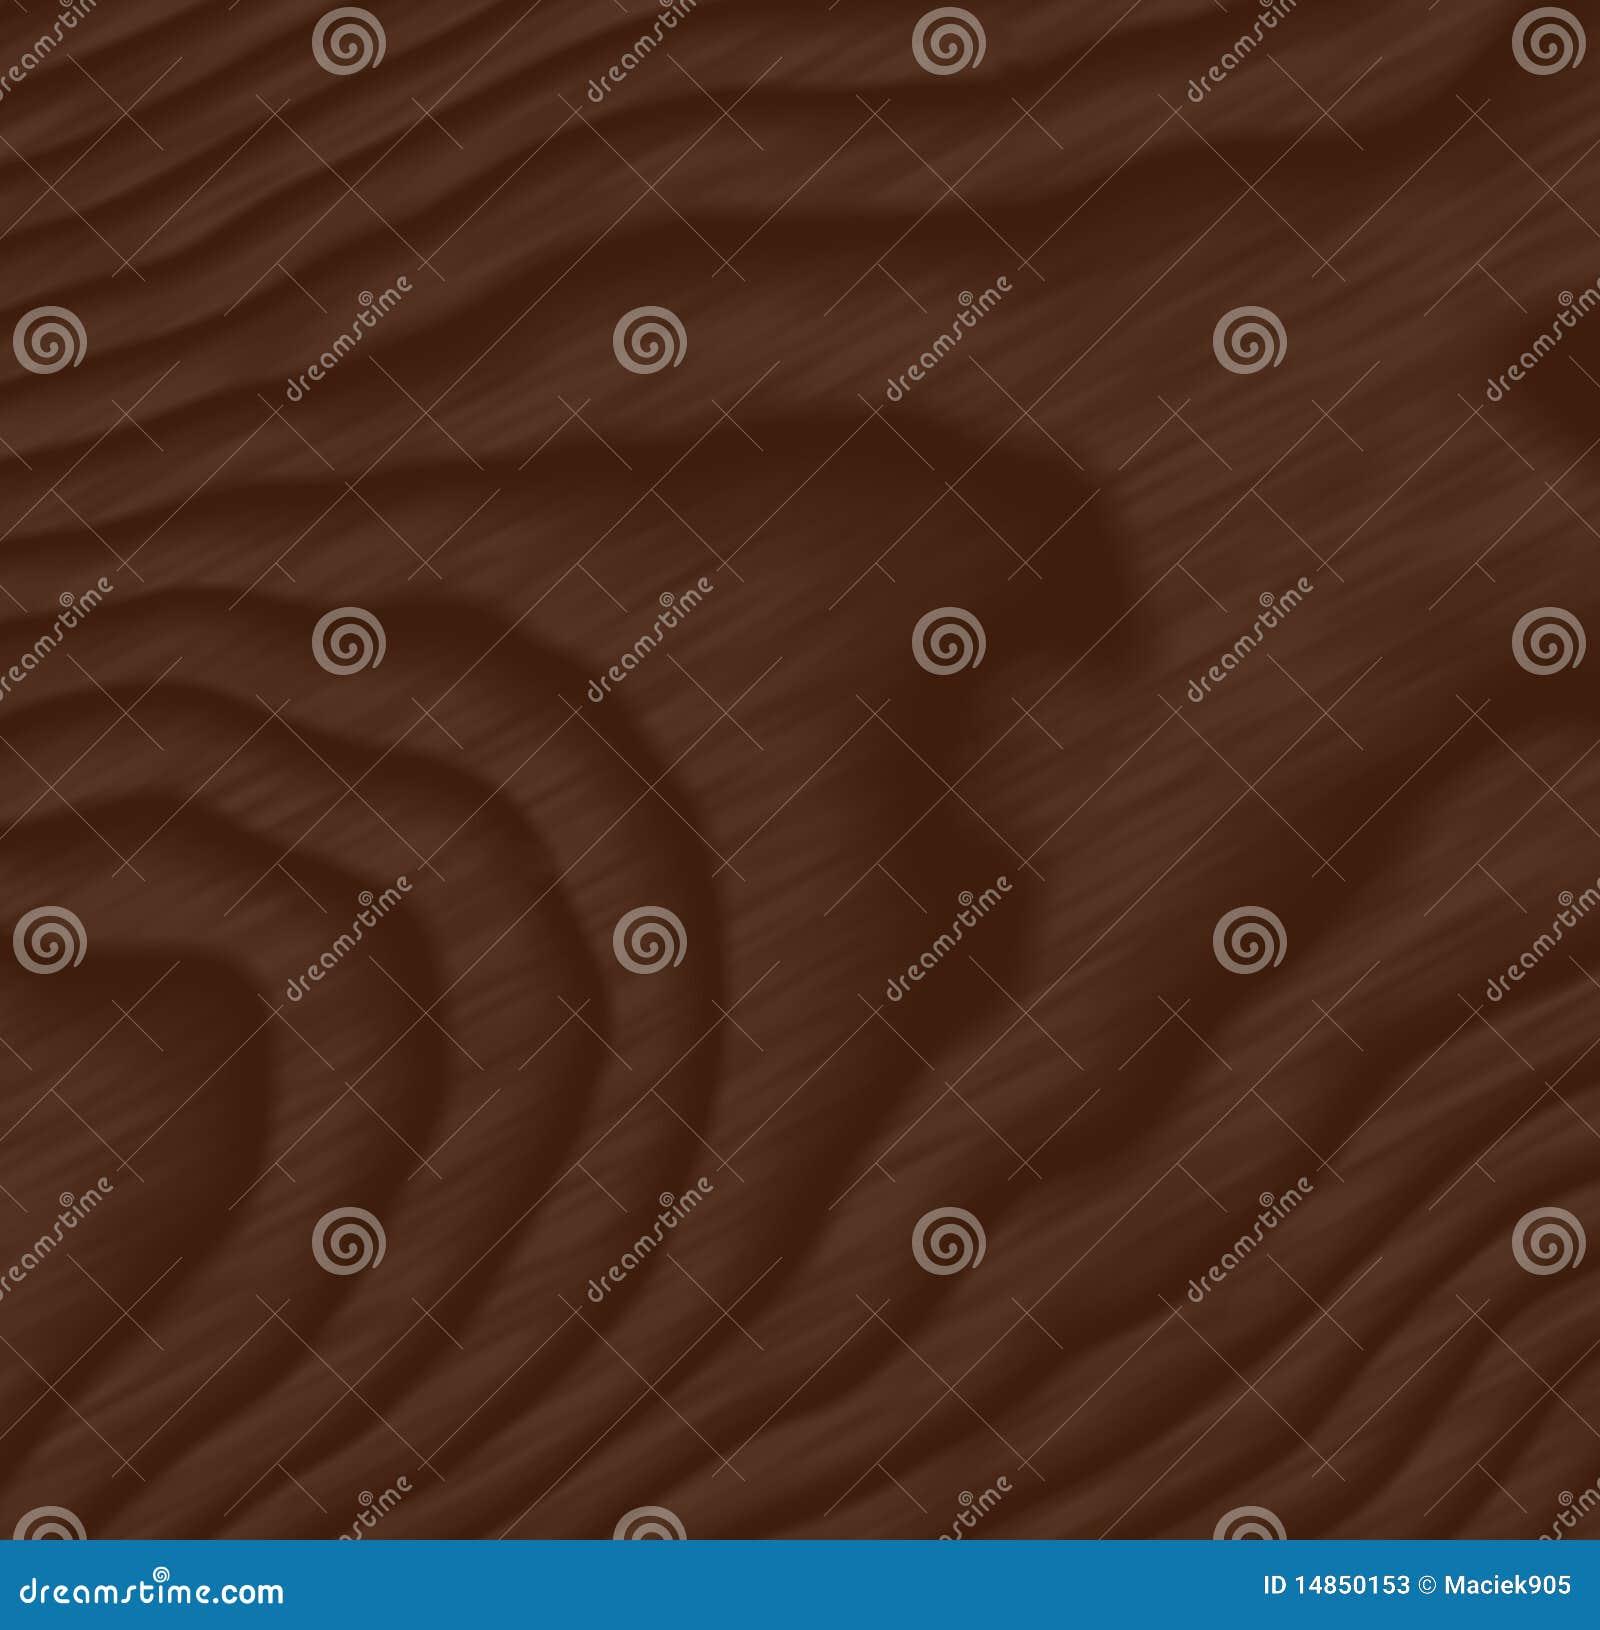 Image of polished wood texture